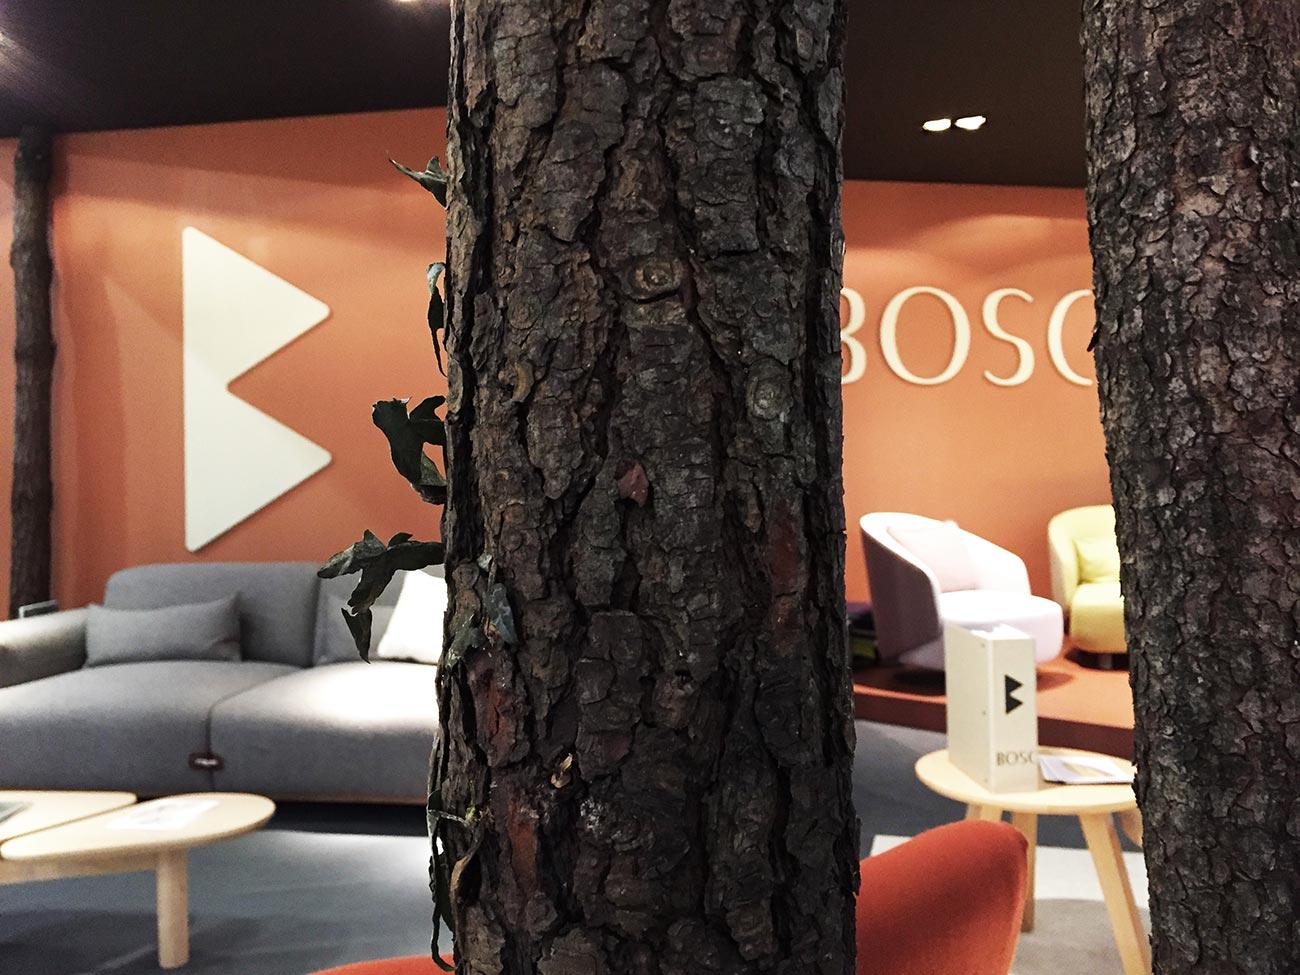 Stand-Design-Iratzoki-Lizaso-Bosc